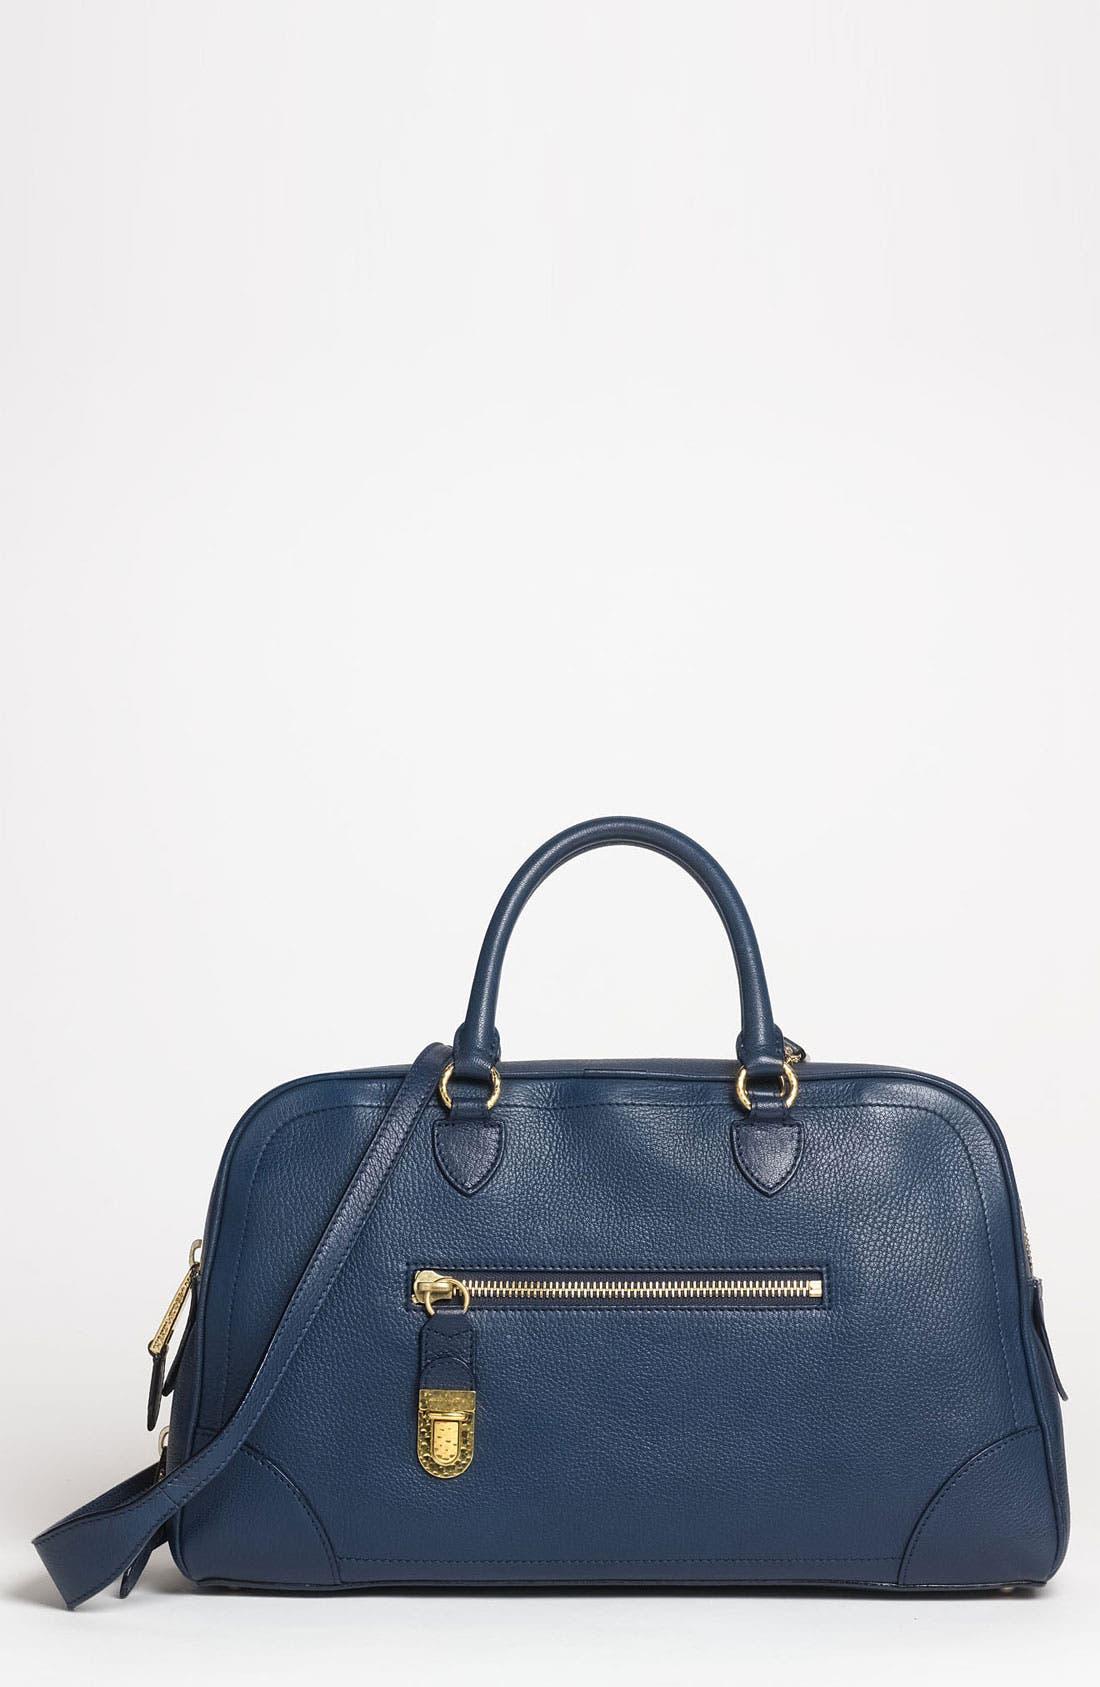 Alternate Image 1 Selected - MARC JACOBS 'Venetia' Leather Satchel